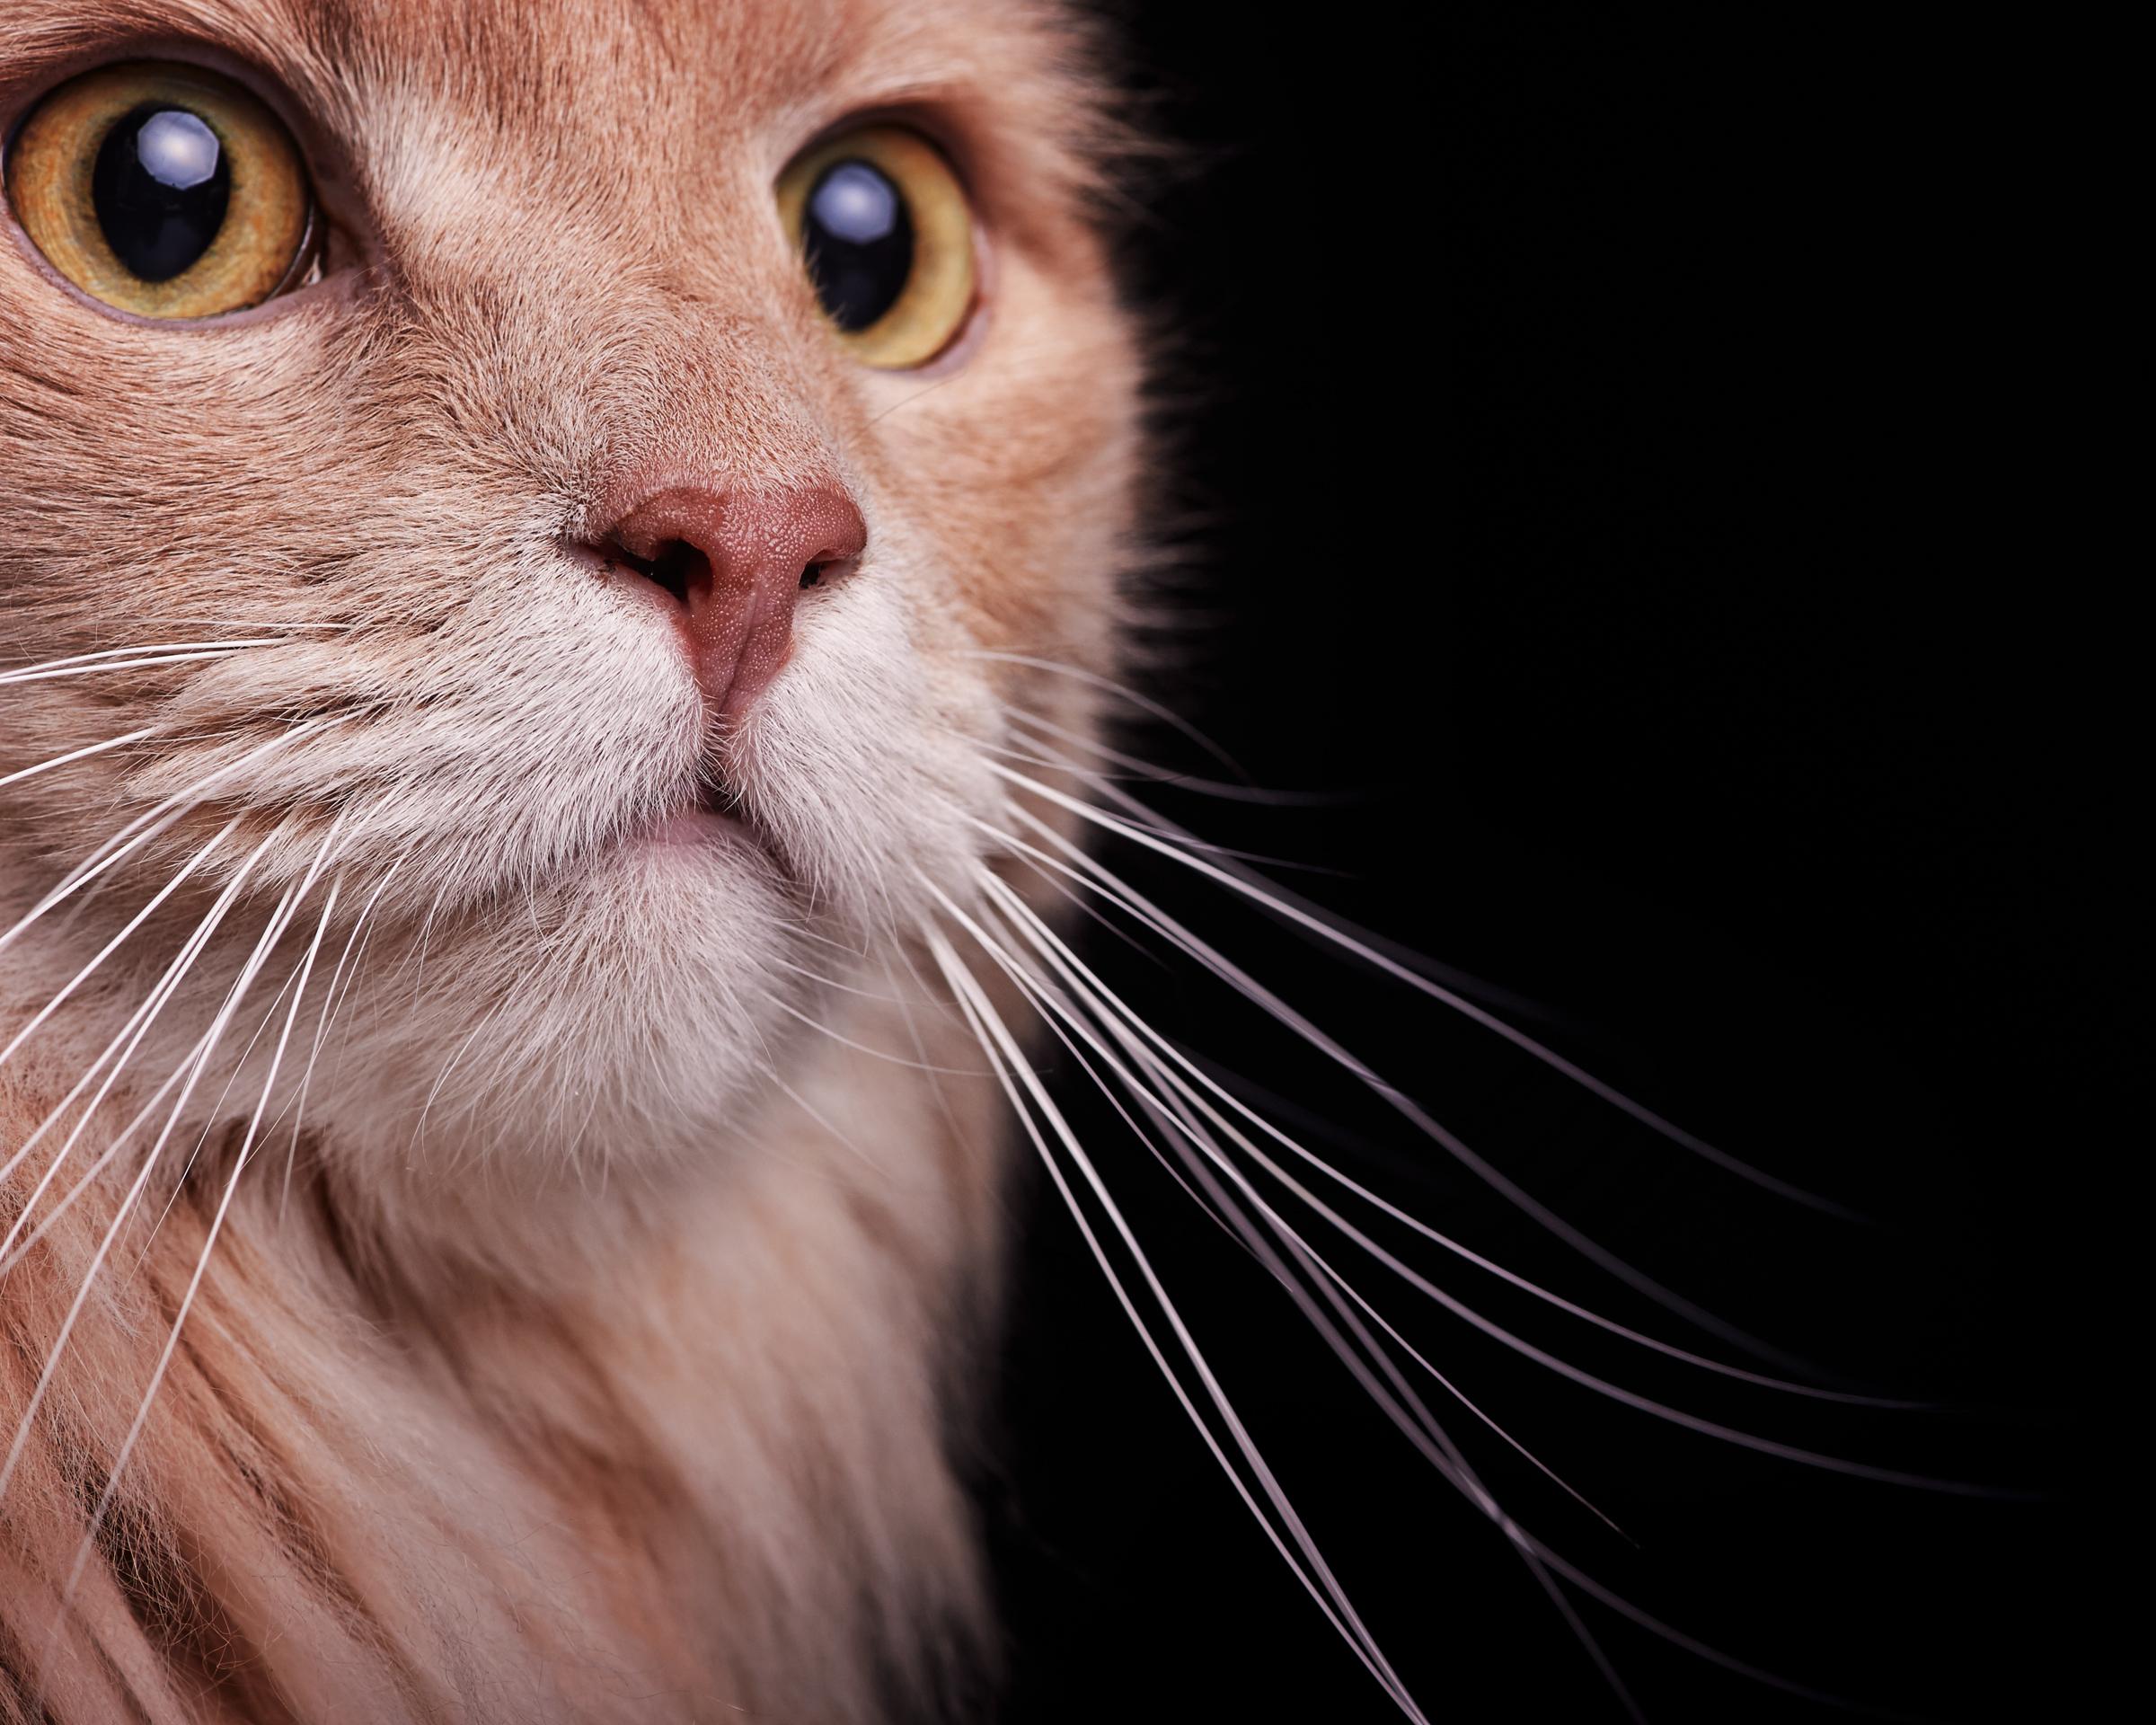 whiskers_cat_four_paws_portrait_pet_photography